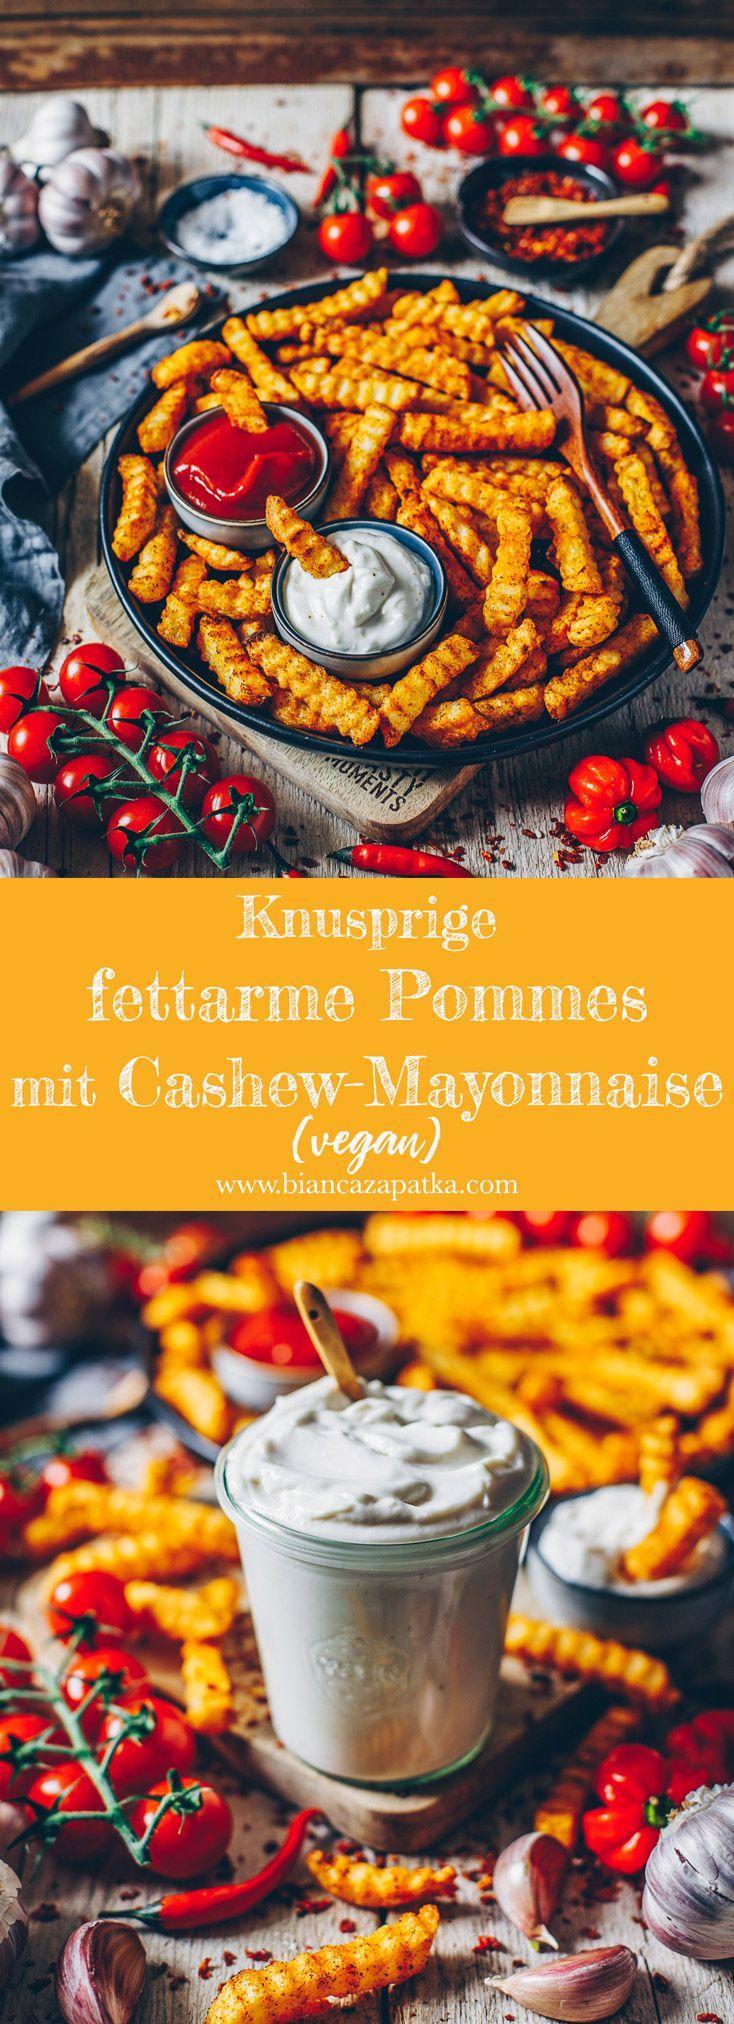 Knusprige fettarme Pommes mit Cashew-Mayonnaise (vegan) - Bianca Zapatka | Rezepte